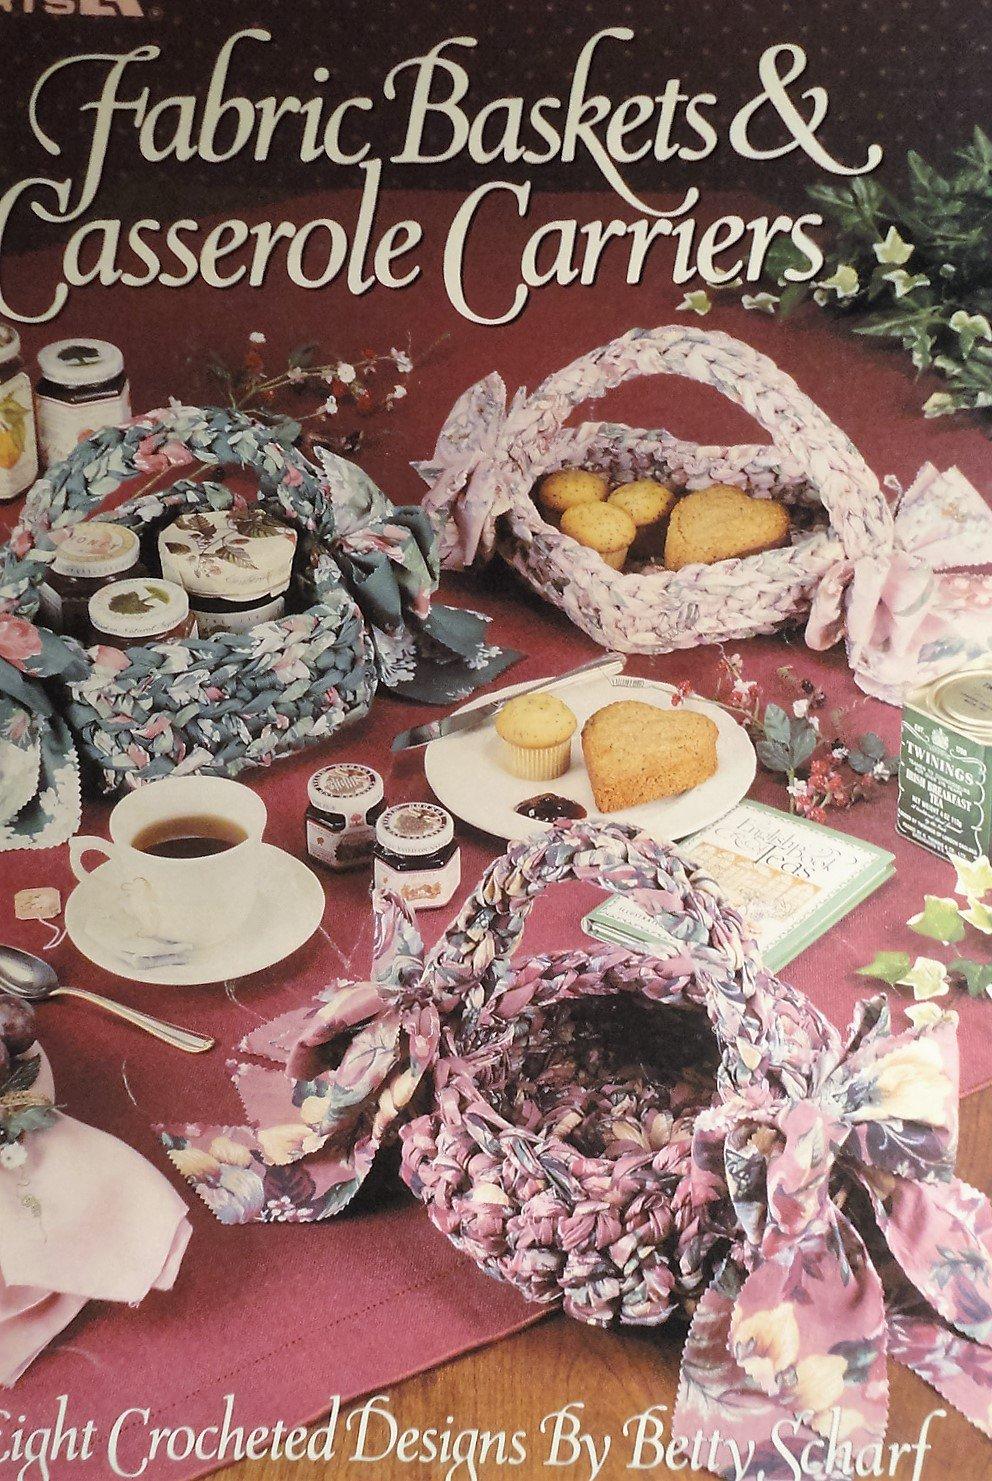 Leisure Arts 2218 Fabric Baskets & Casserole Carriers by Betty Scharf